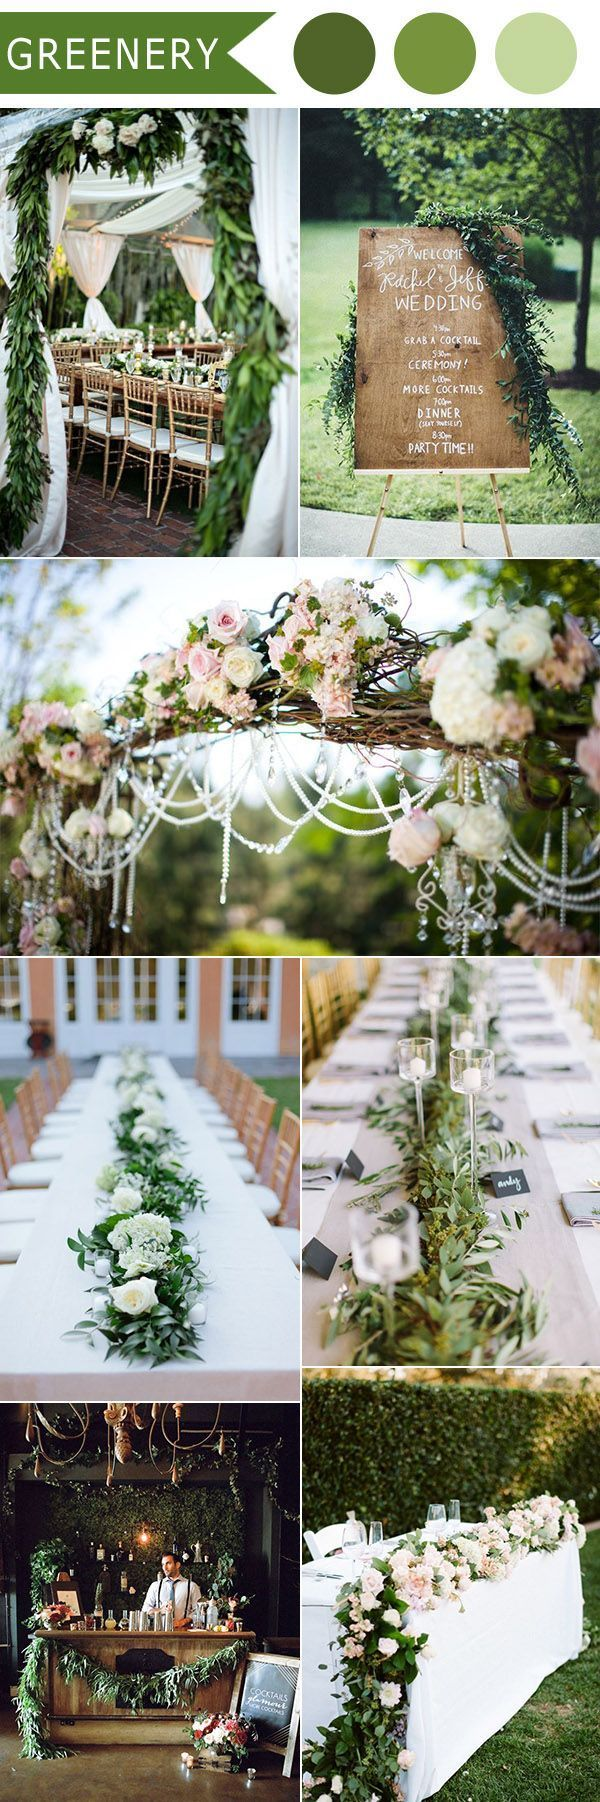 2016-trending-greenery-natural-lush-wedding-ideas.jpg (600×1802) Mais